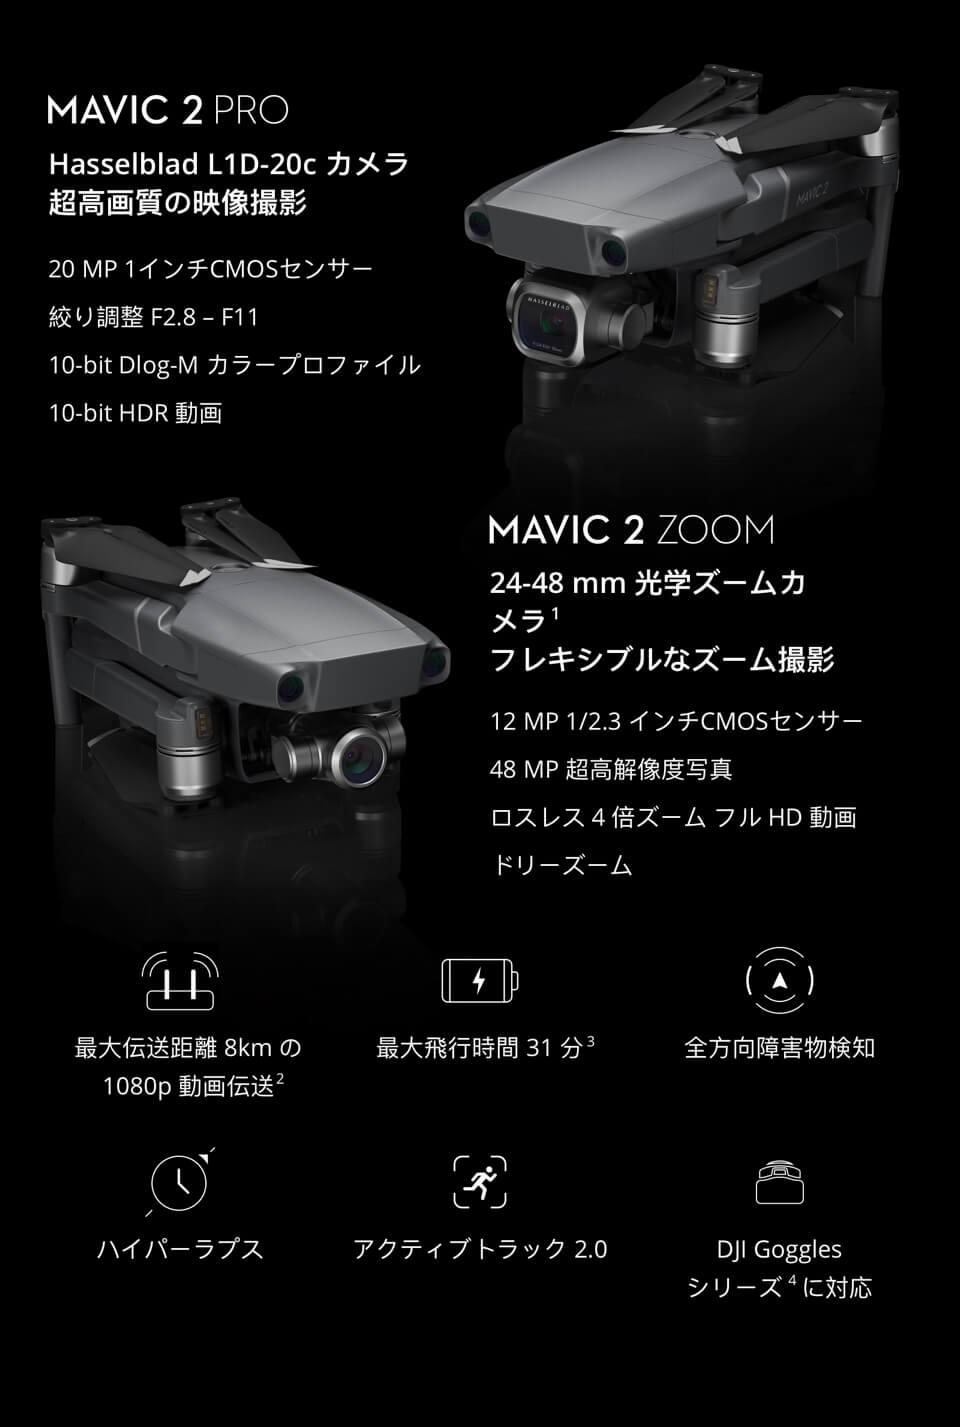 「Mavic 2 pro 超高画質の映像撮影」「Mavic 2 zoom フレキシブルなズーム撮影」